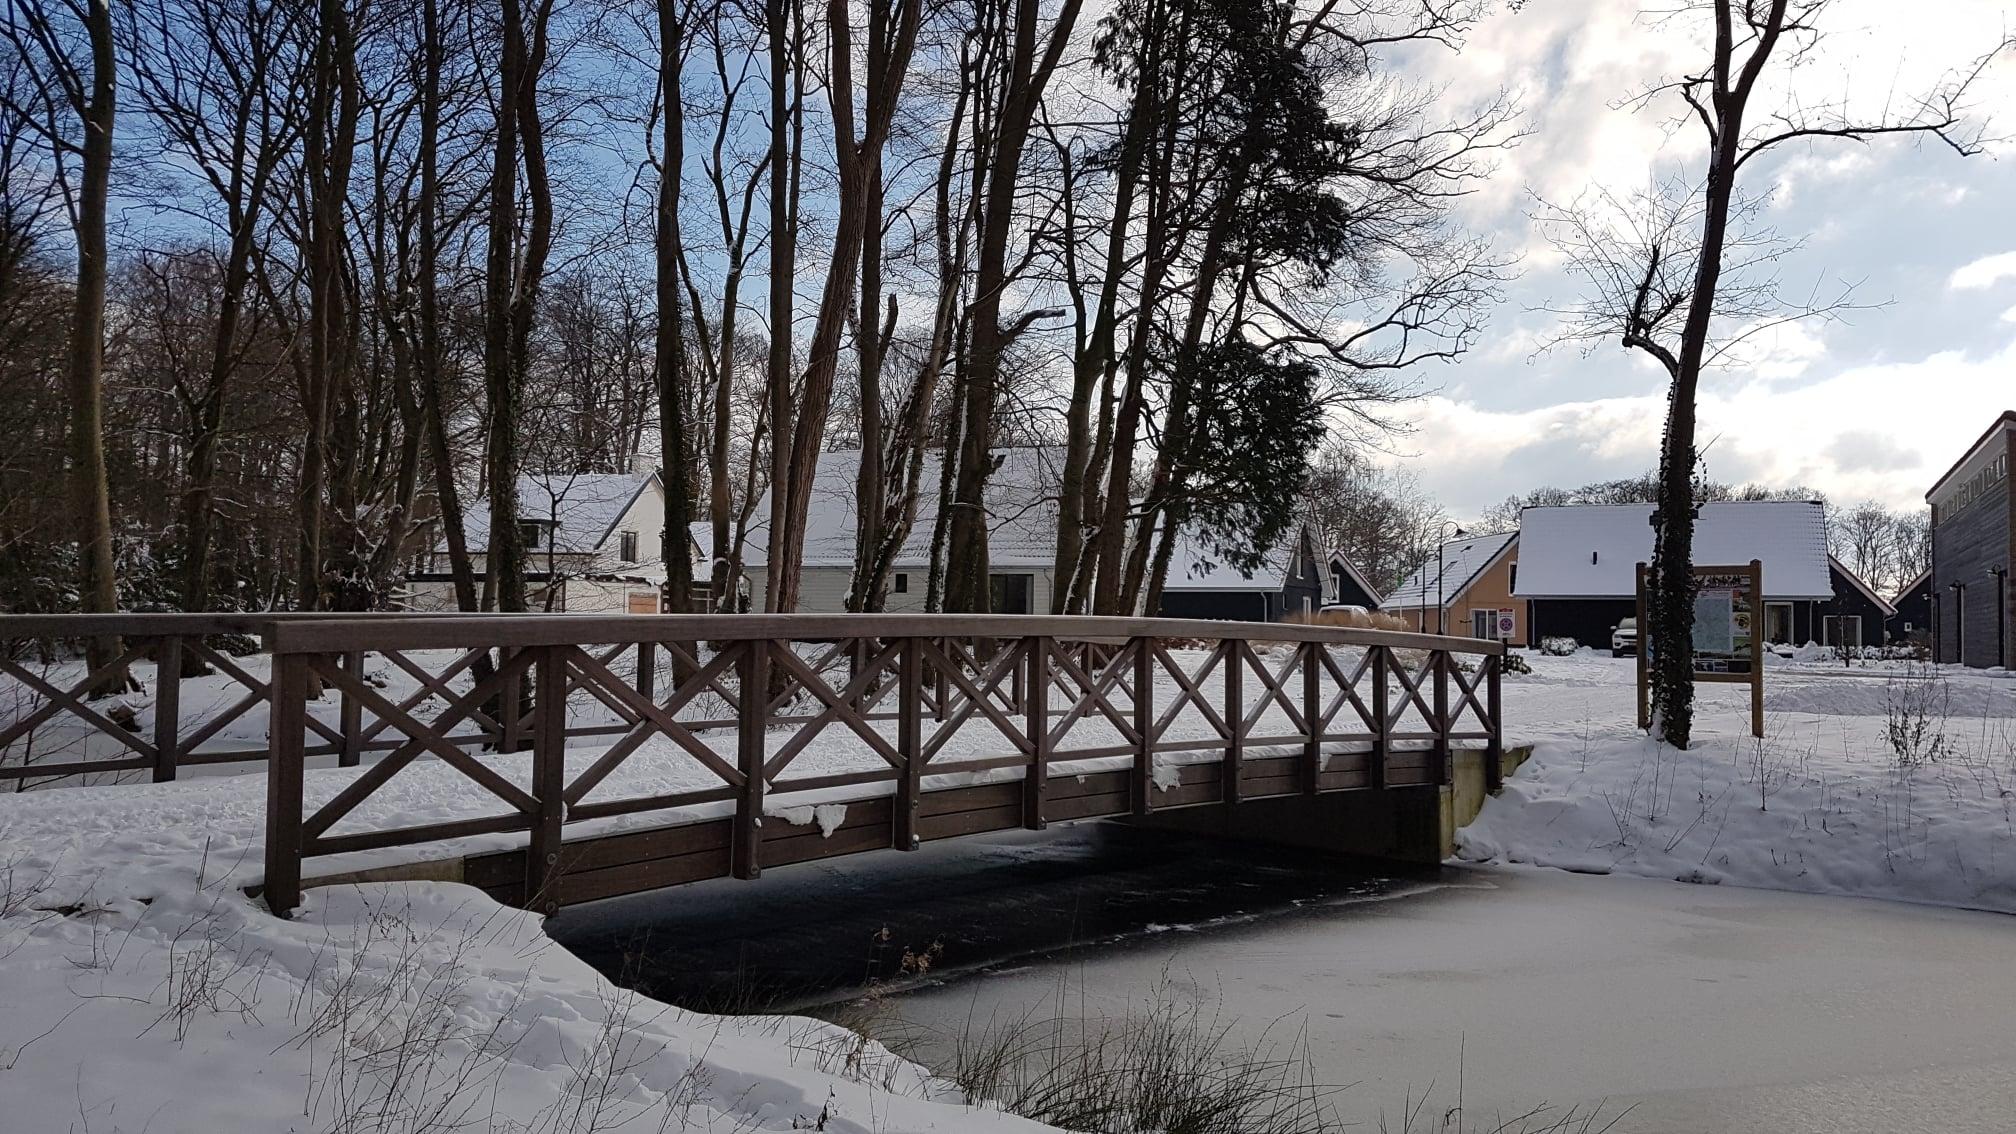 Sneeuw op Villapark Ehzerburg - foto 1